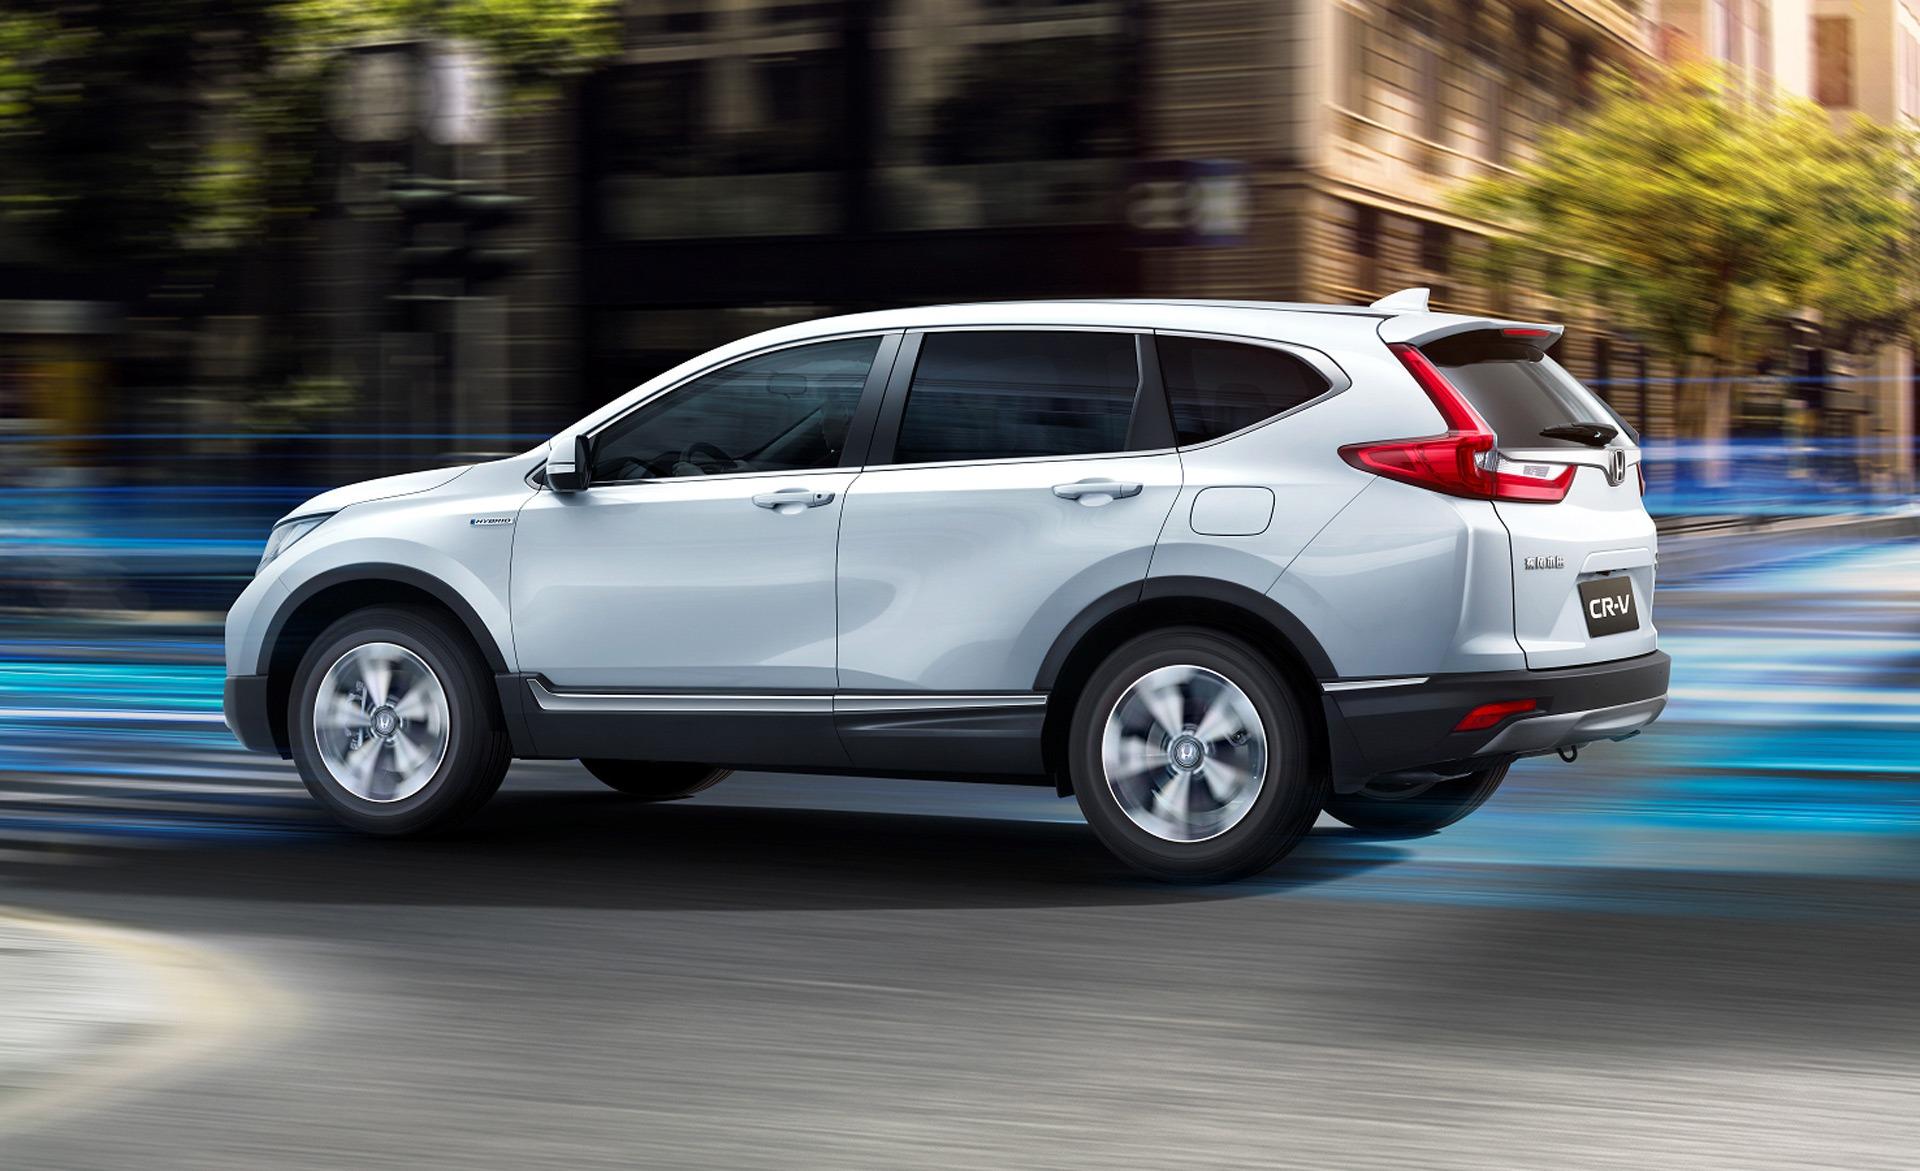 2023 Honda CRV Images